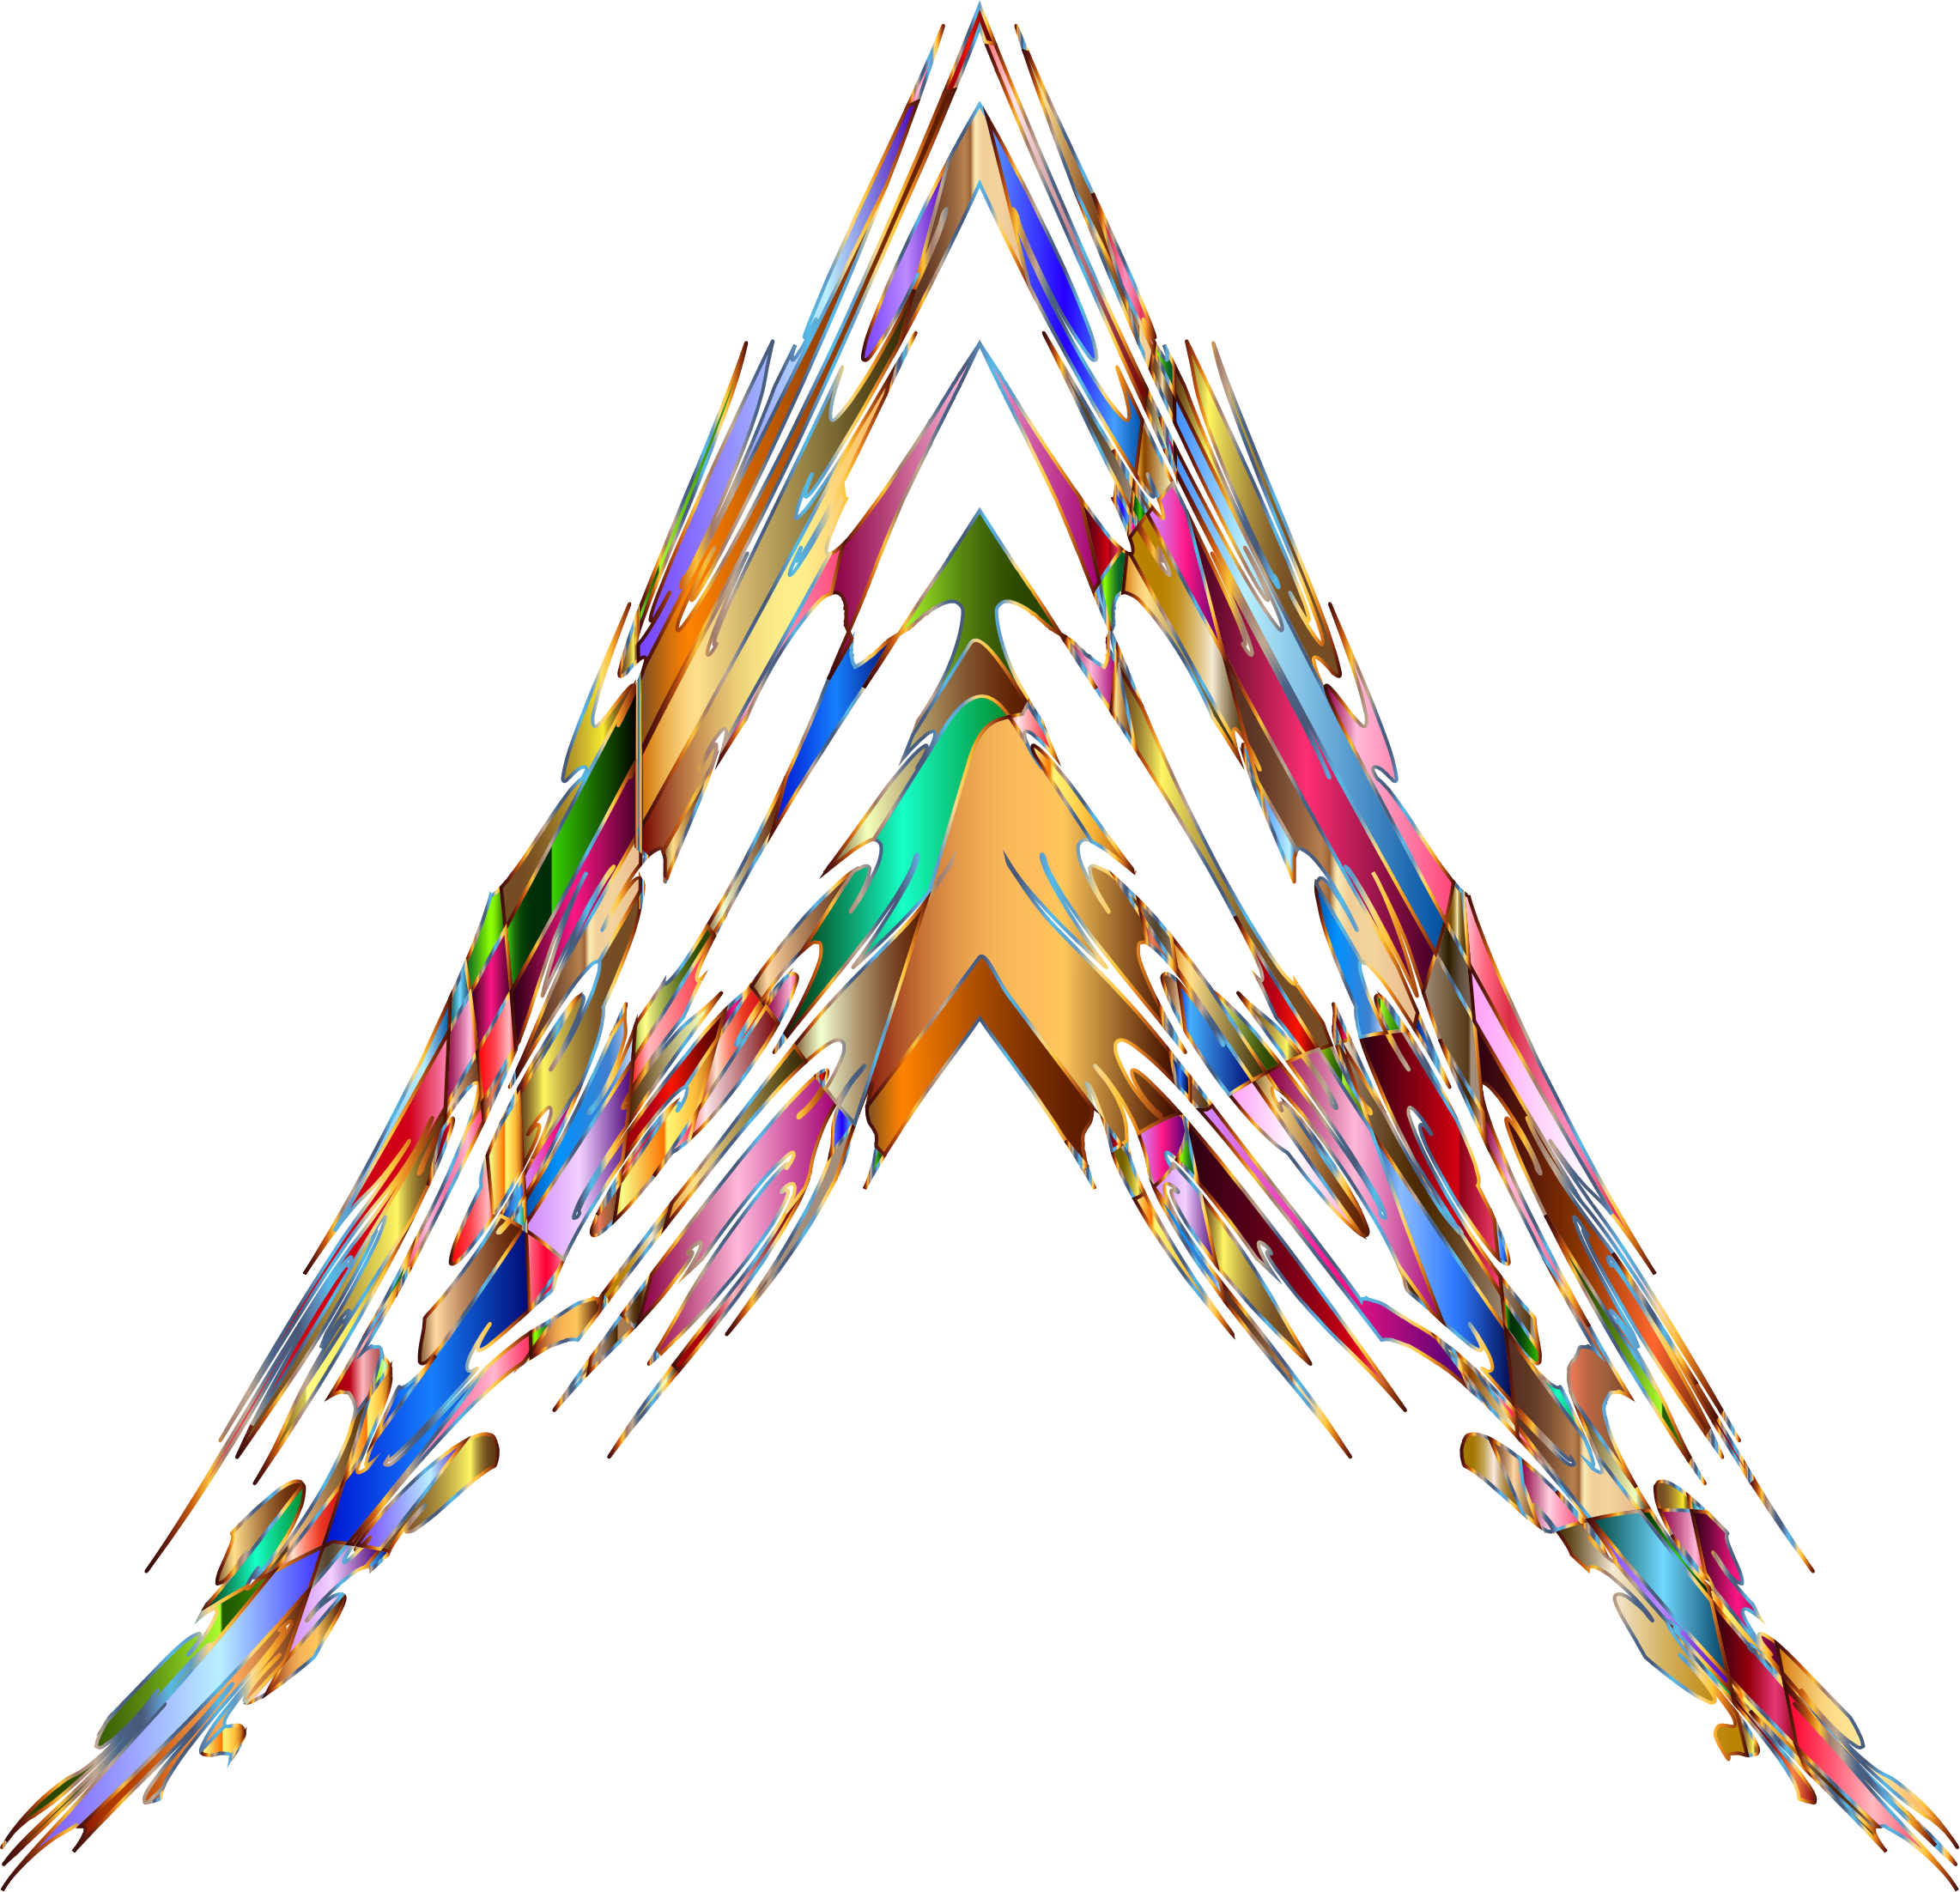 Prismatic arrowhead big image. Crystal clipart abstract art